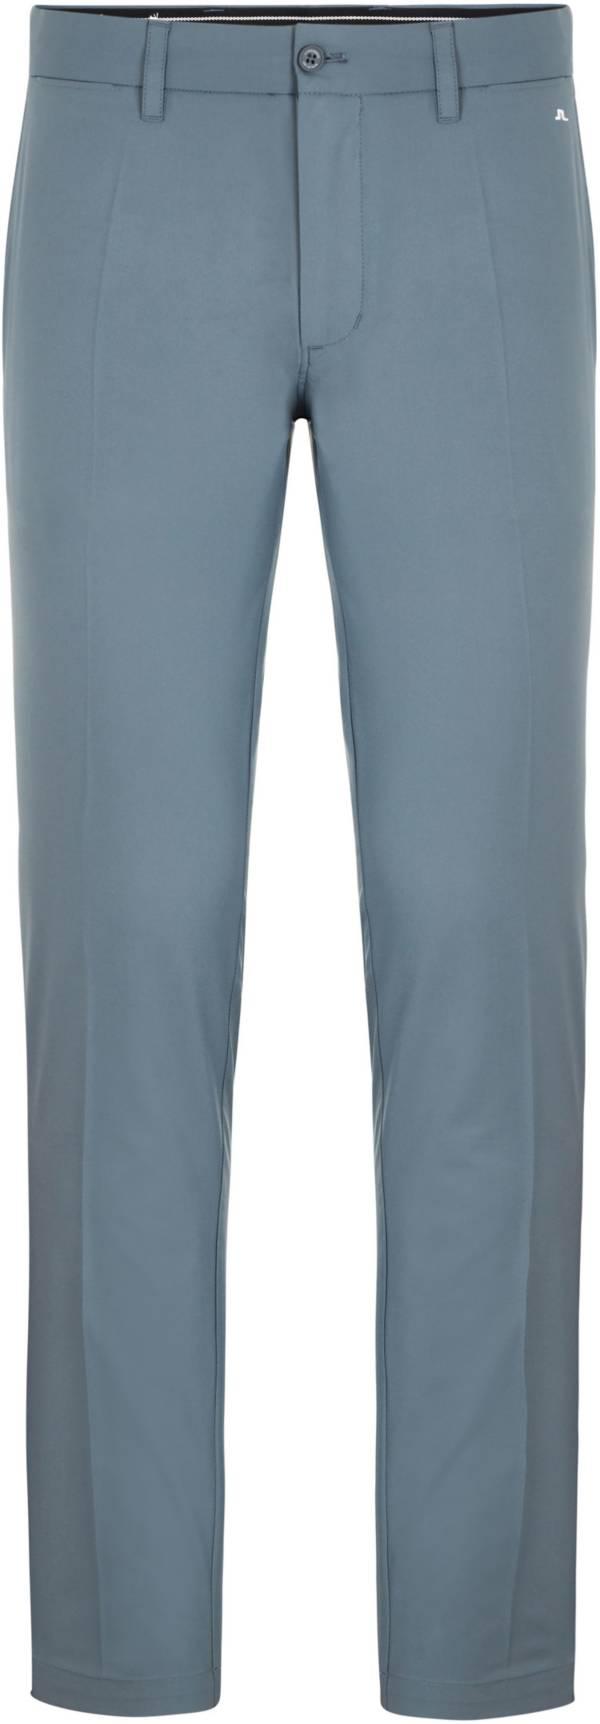 J.Lindeberg Men's Elof Golf Pants product image